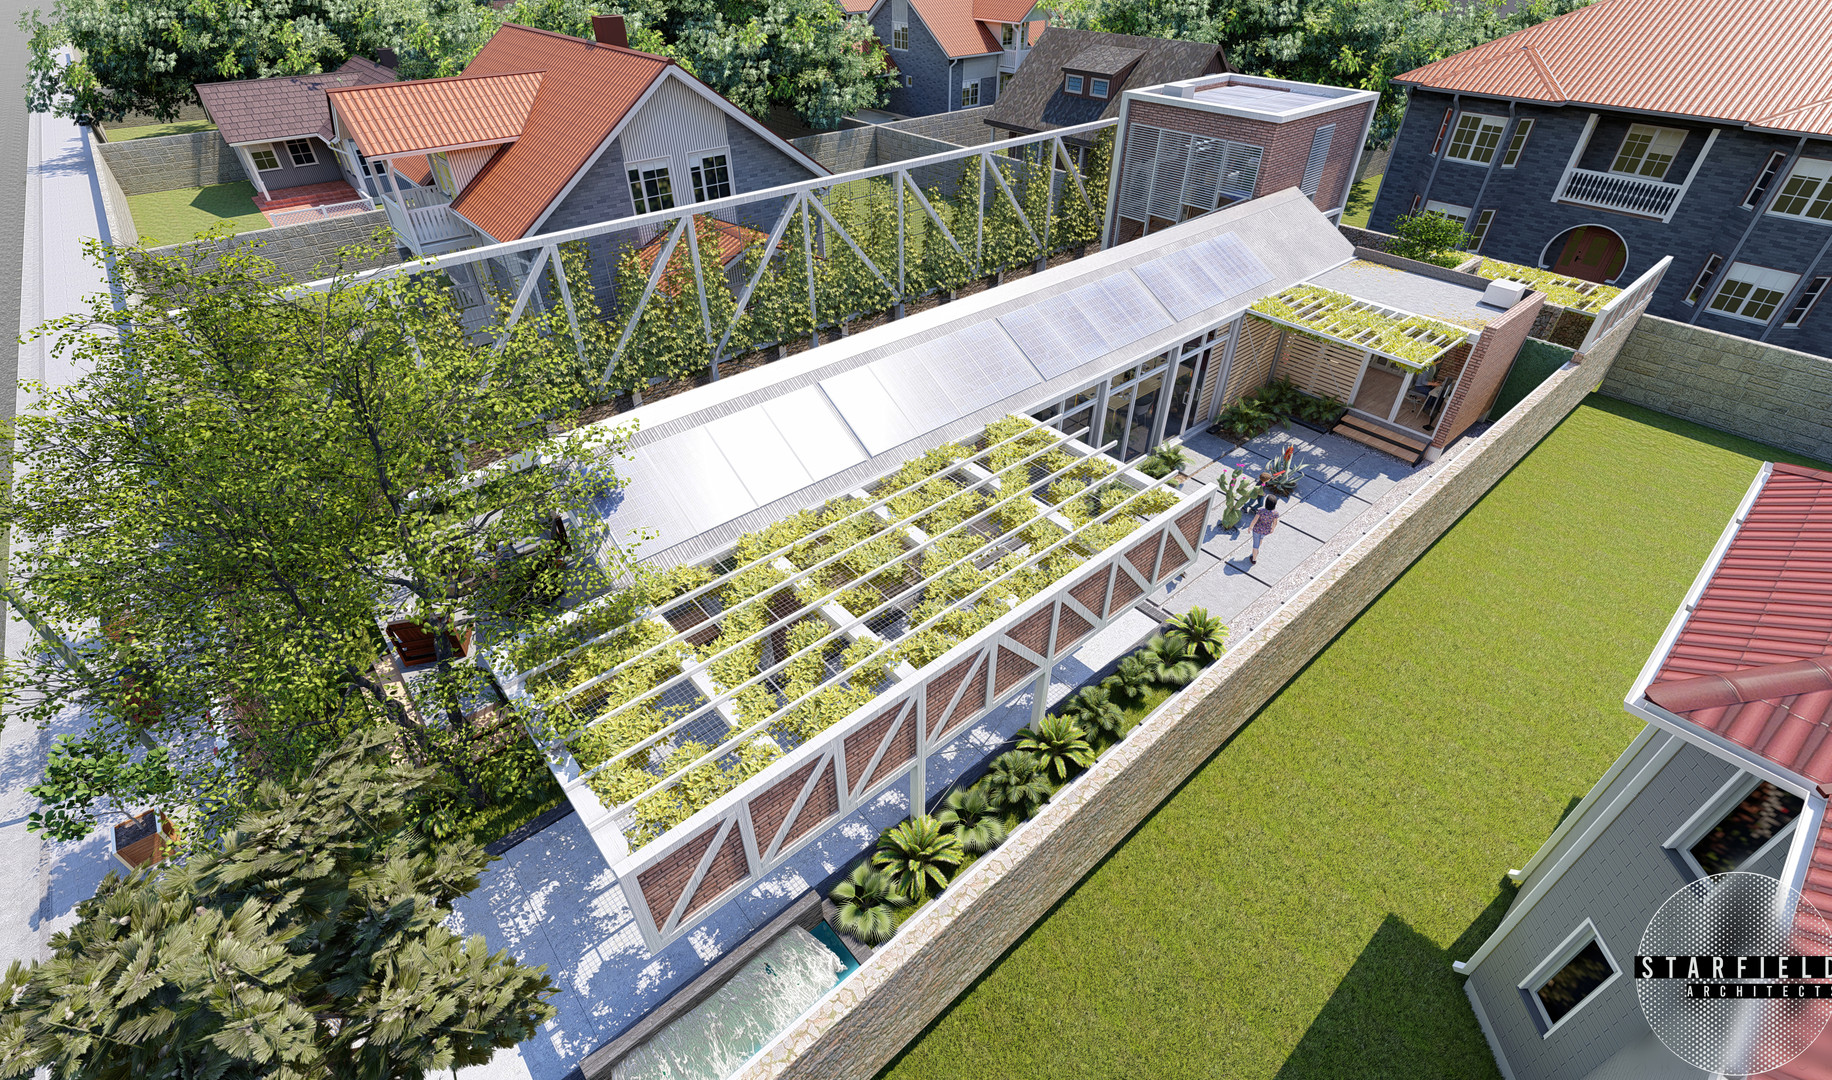 Arise_Architects_House Meyer_Render 10.j